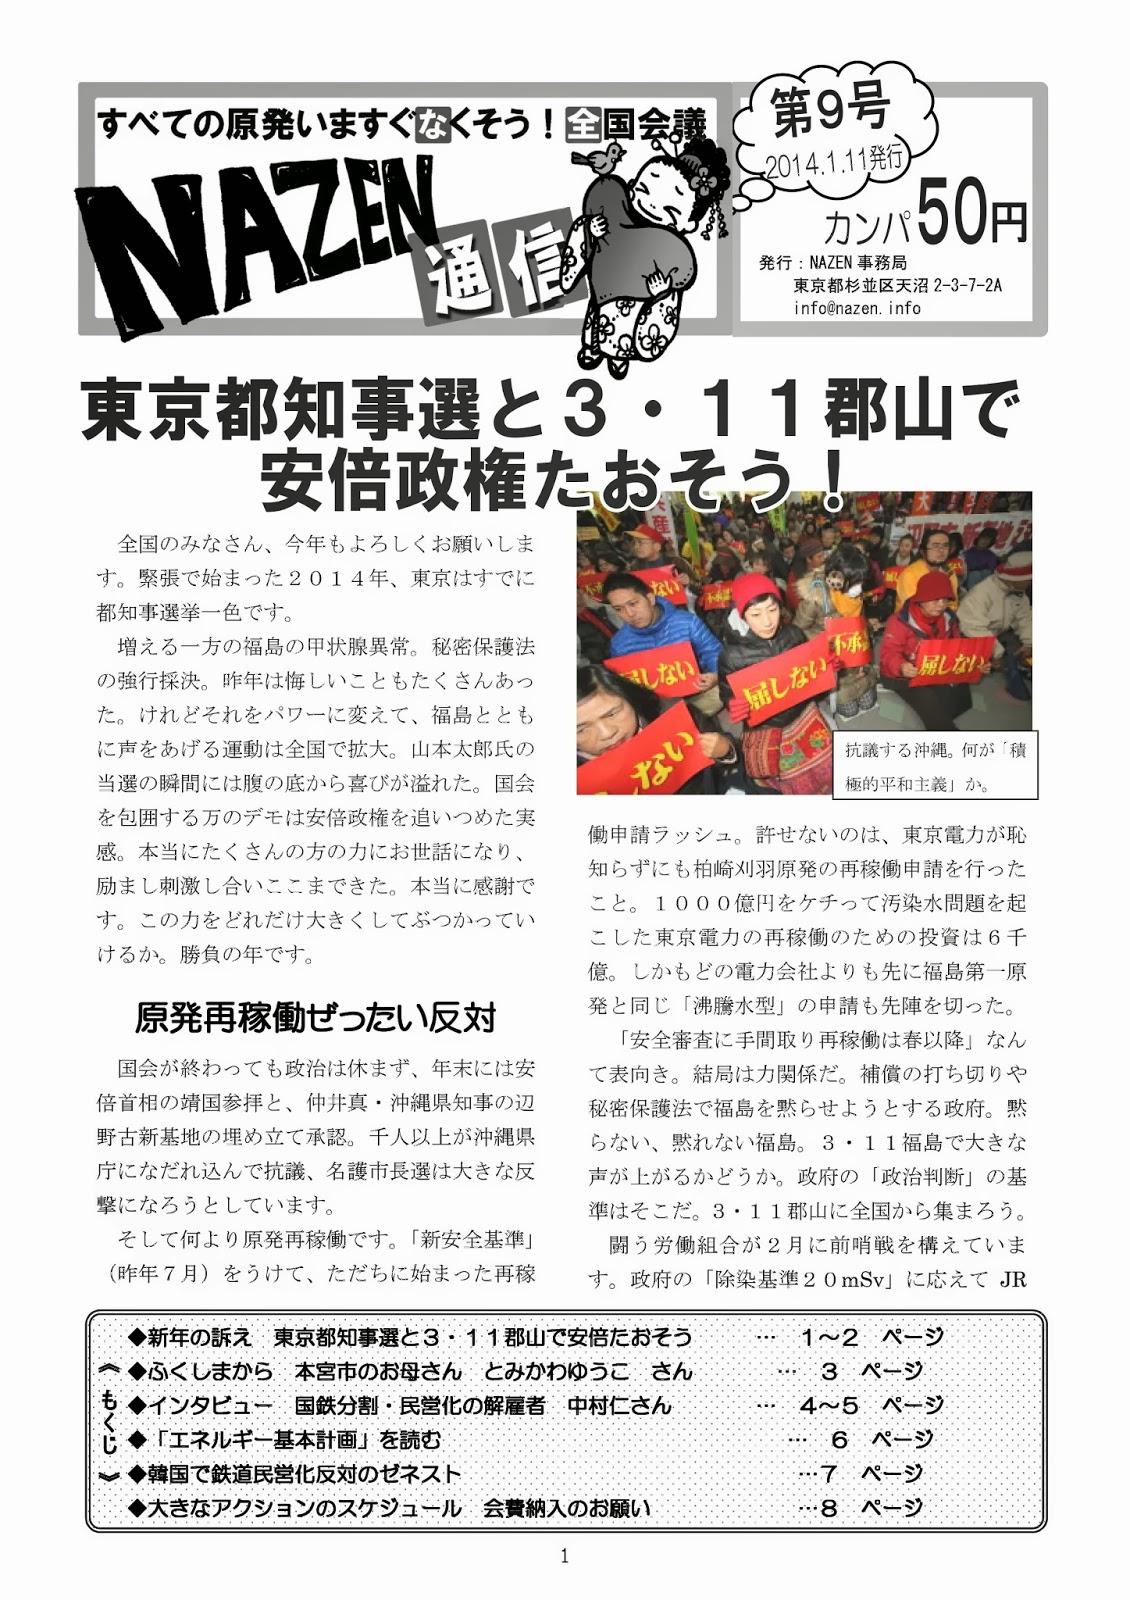 http://4754e3a988bc1d78.lolipop.jp/tsushin_09.pdf